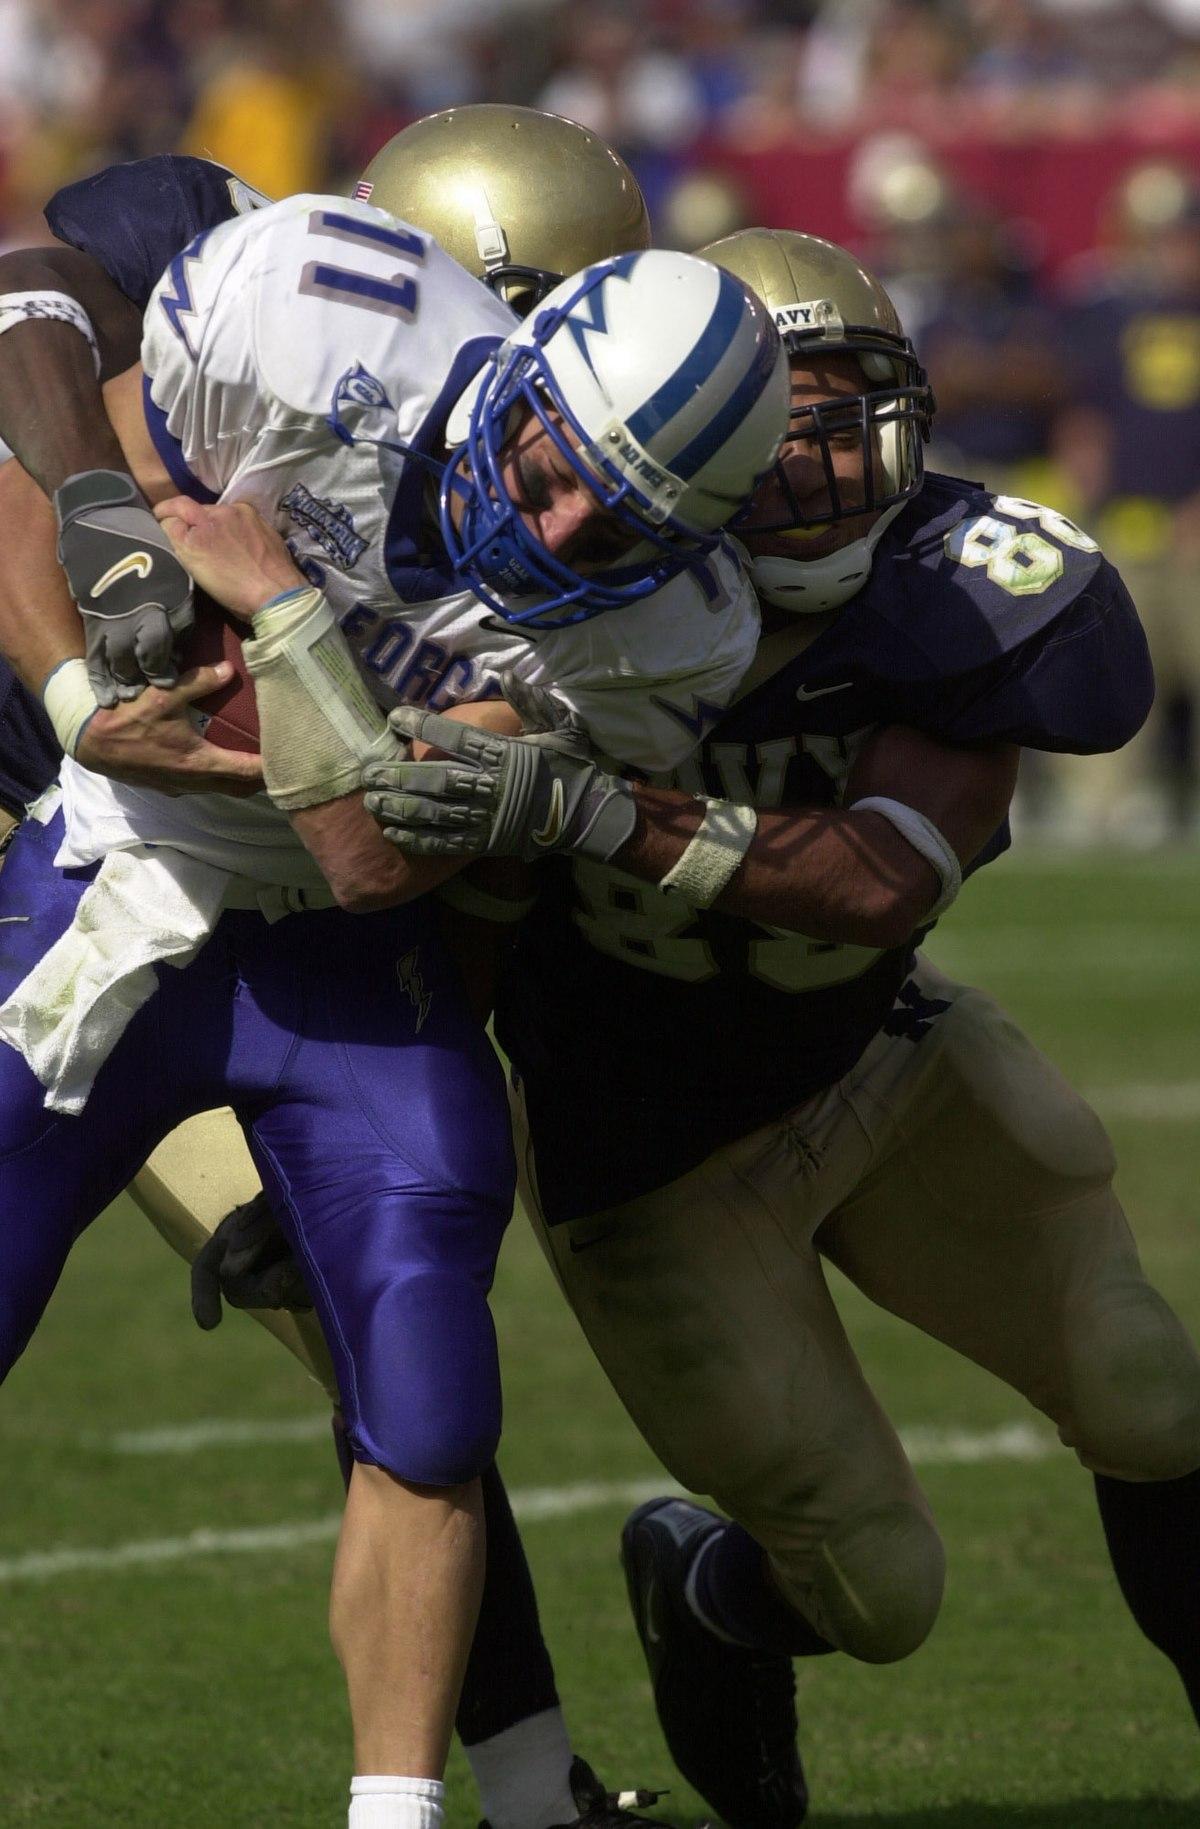 sports wikipedia chance football quarterback field harridge wiki upload commons tackling